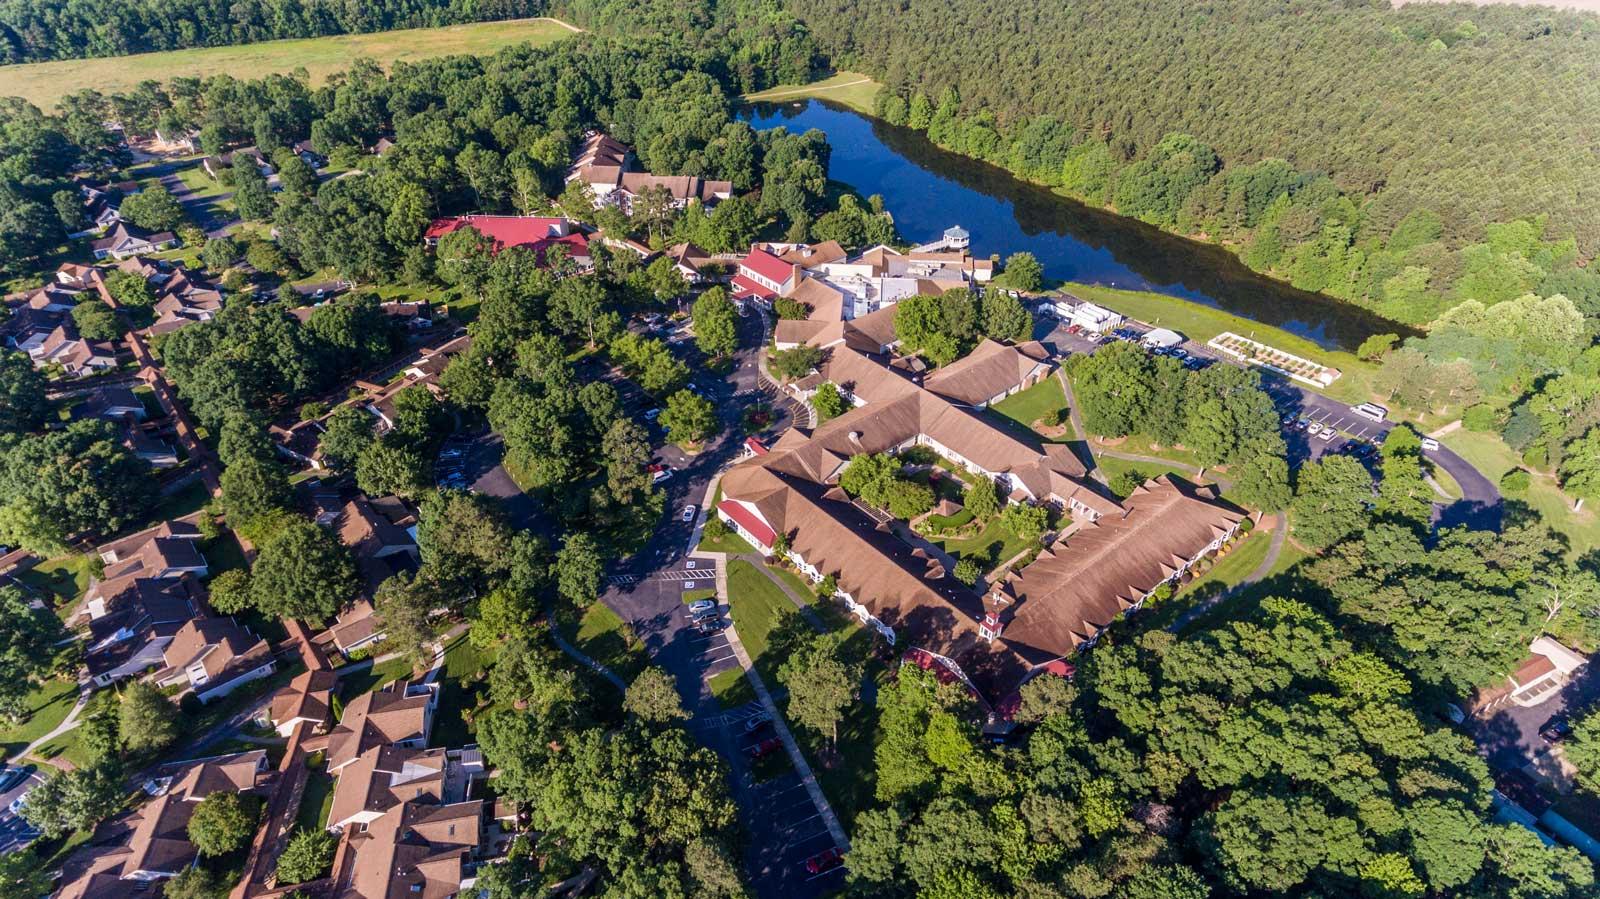 rwc-campus-overhead-1